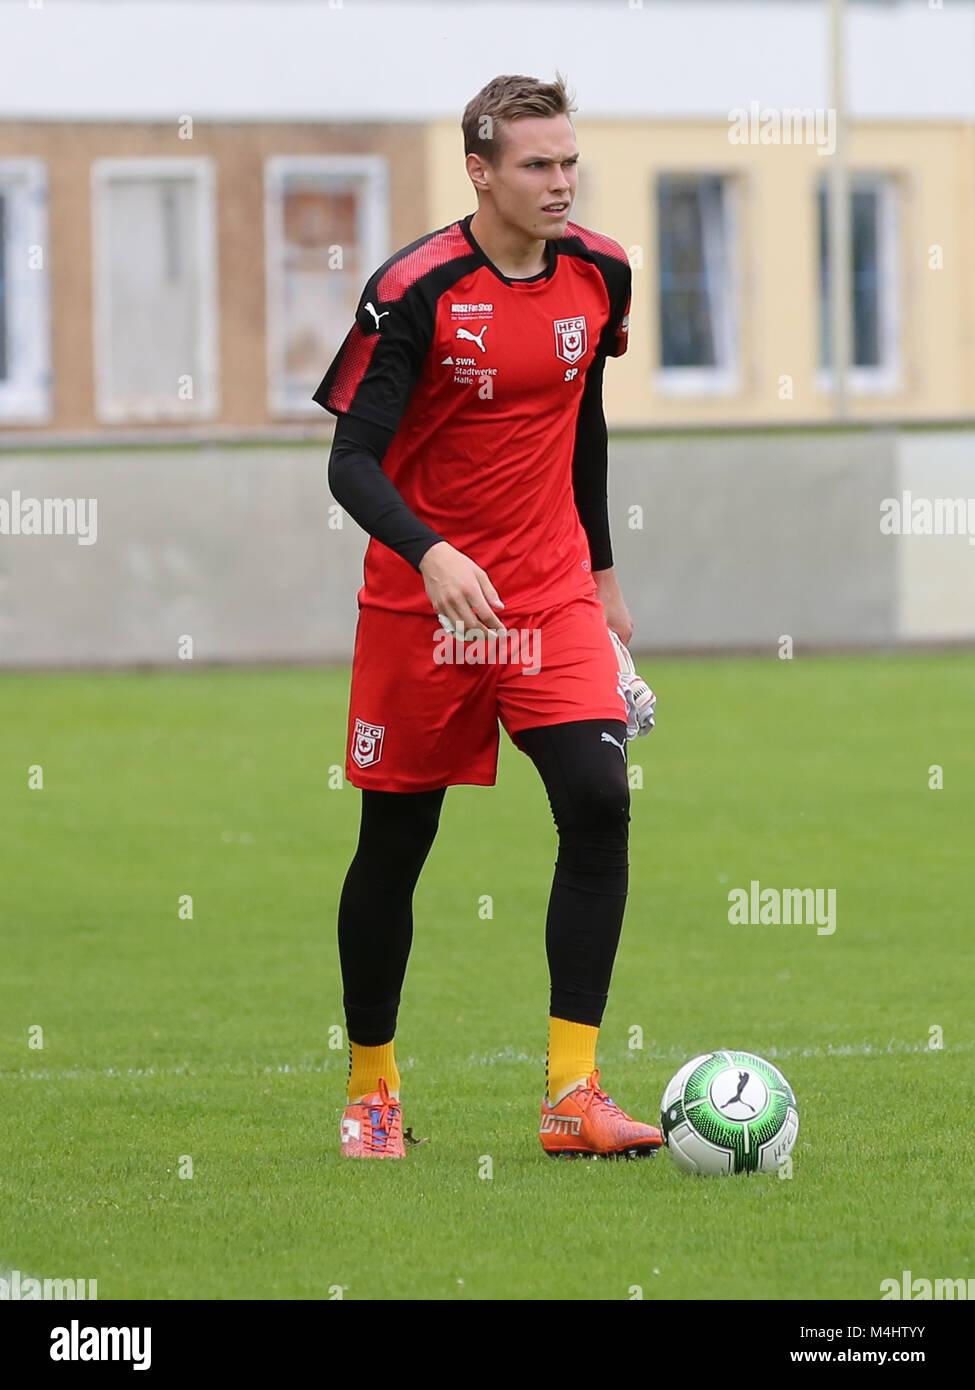 Goalkeeper Tom Müller (Hallescher FC) - Stock Image